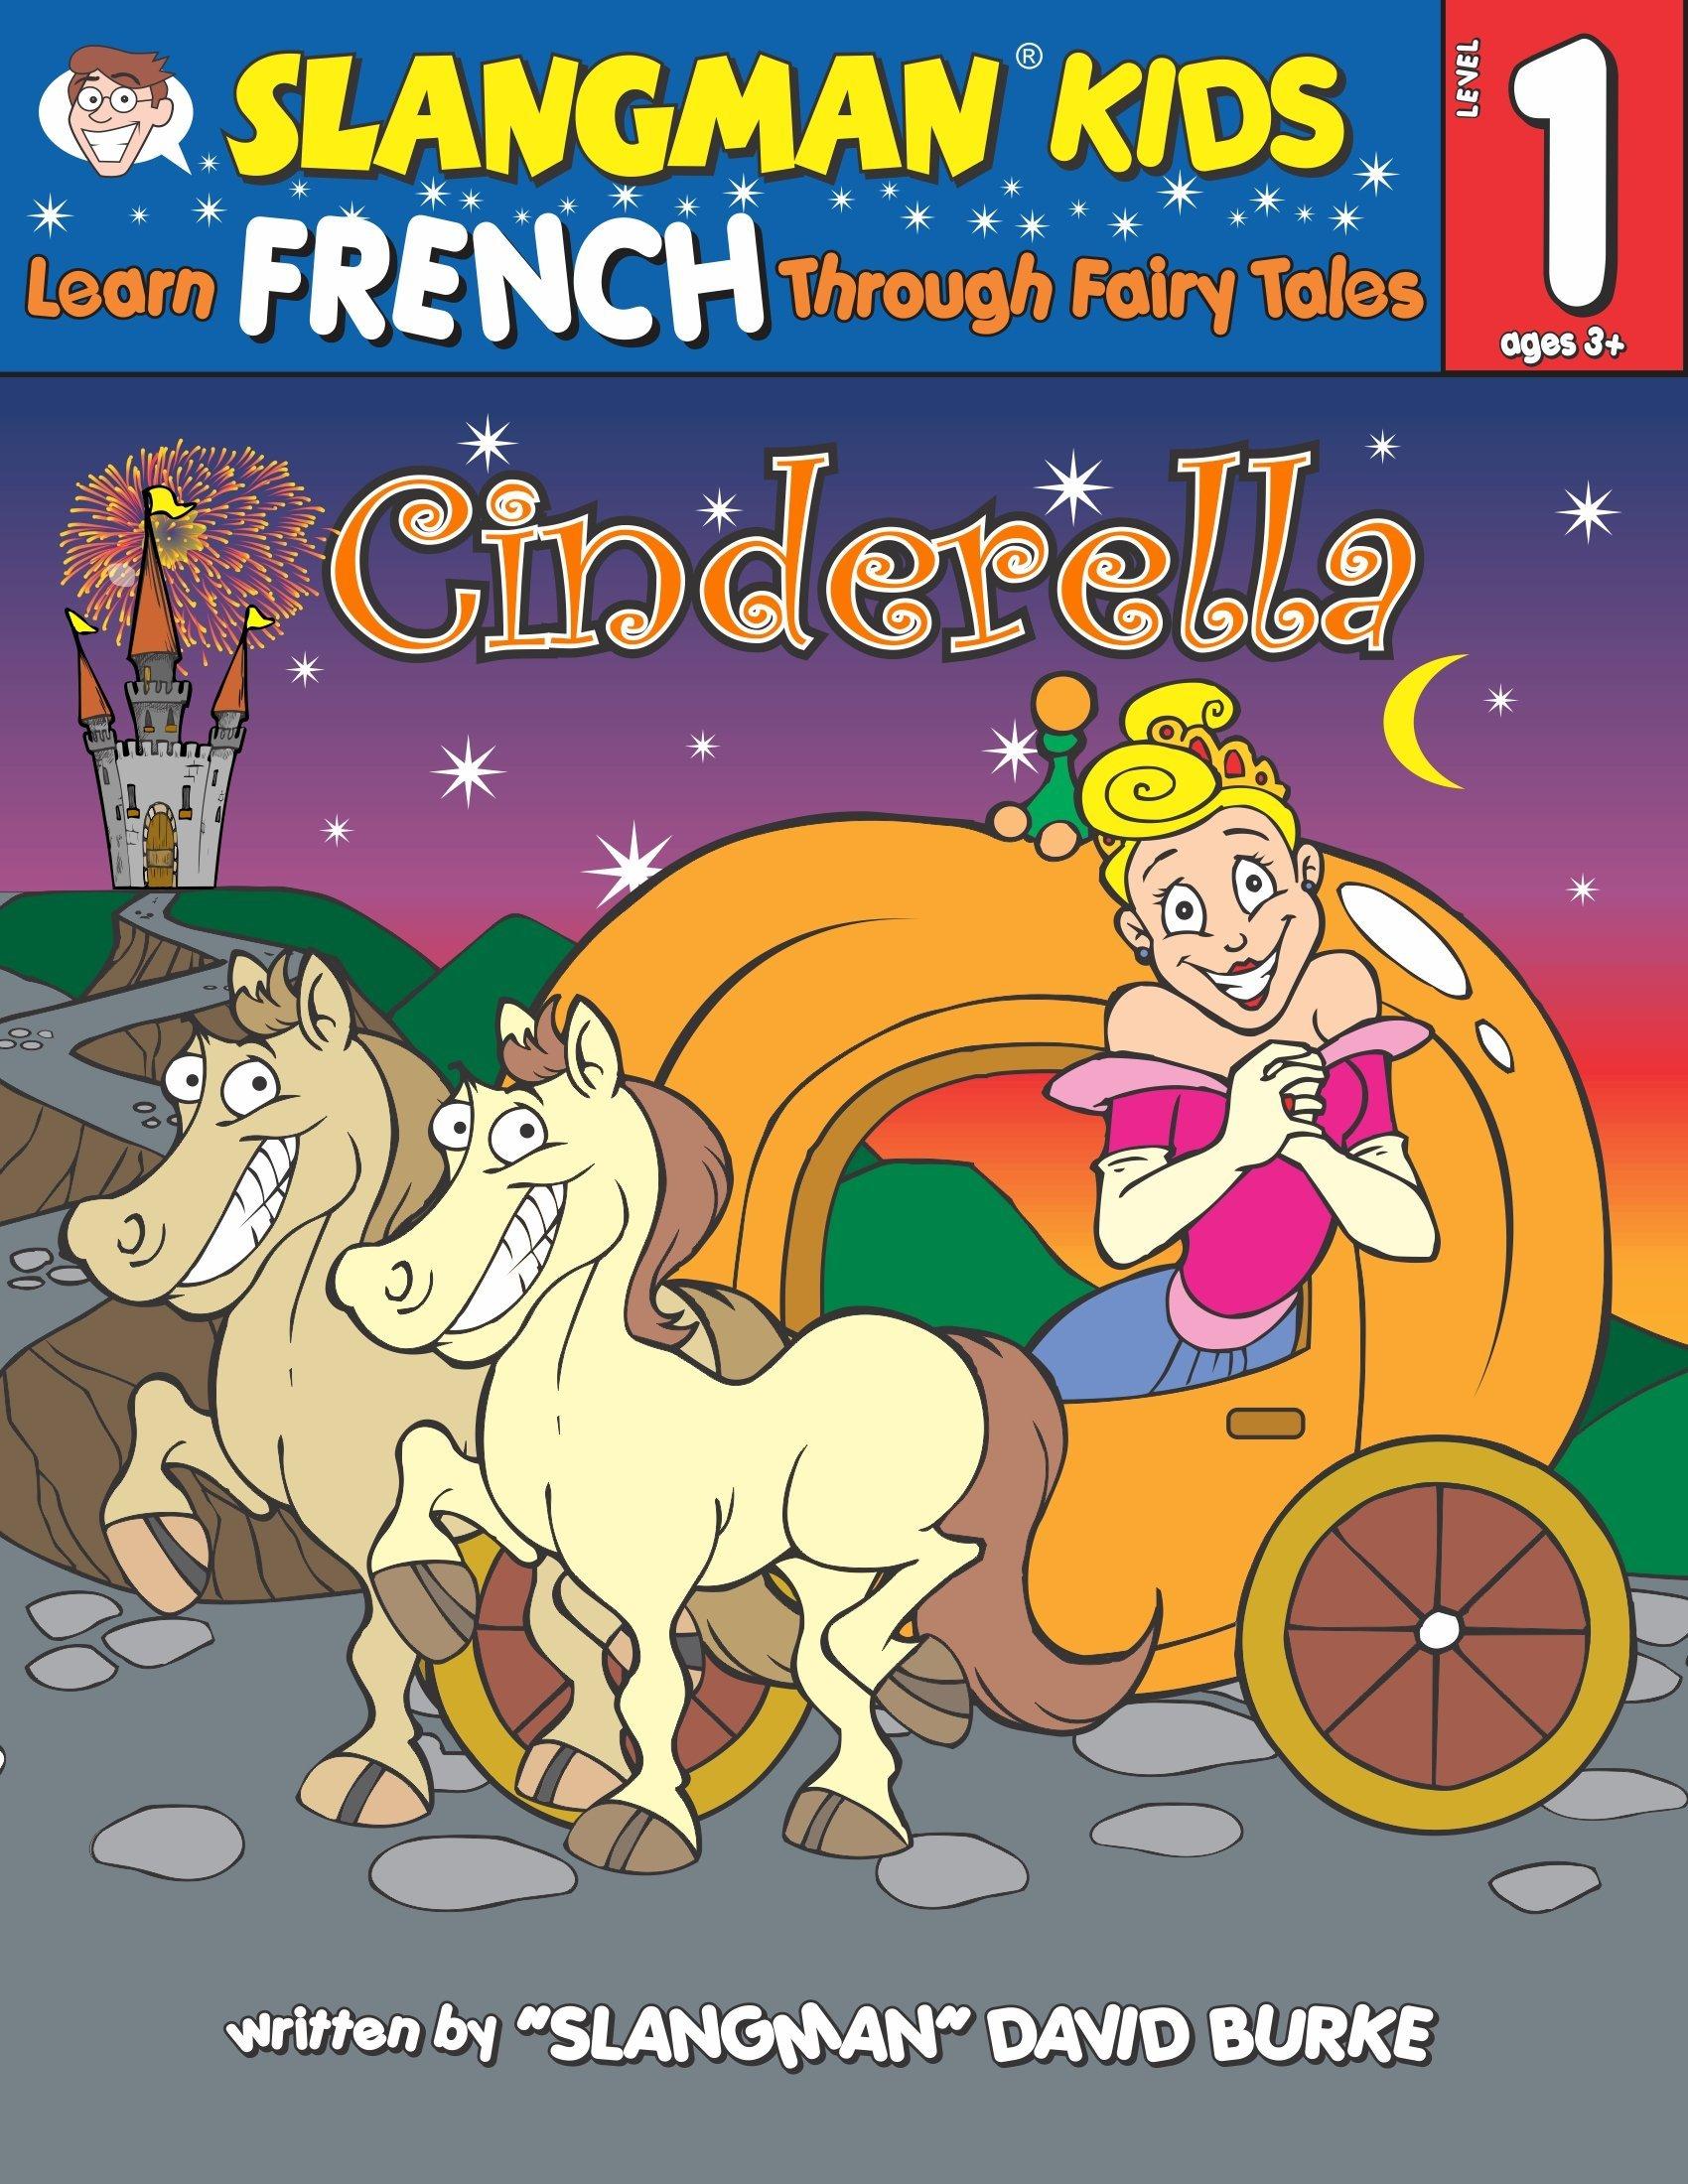 Read Online Learn French Through Fairy Tales: Cinderella, Level 1 (Slangman Kids) (Foreign Language Through Fairy Tales) (English and French Edition) pdf epub